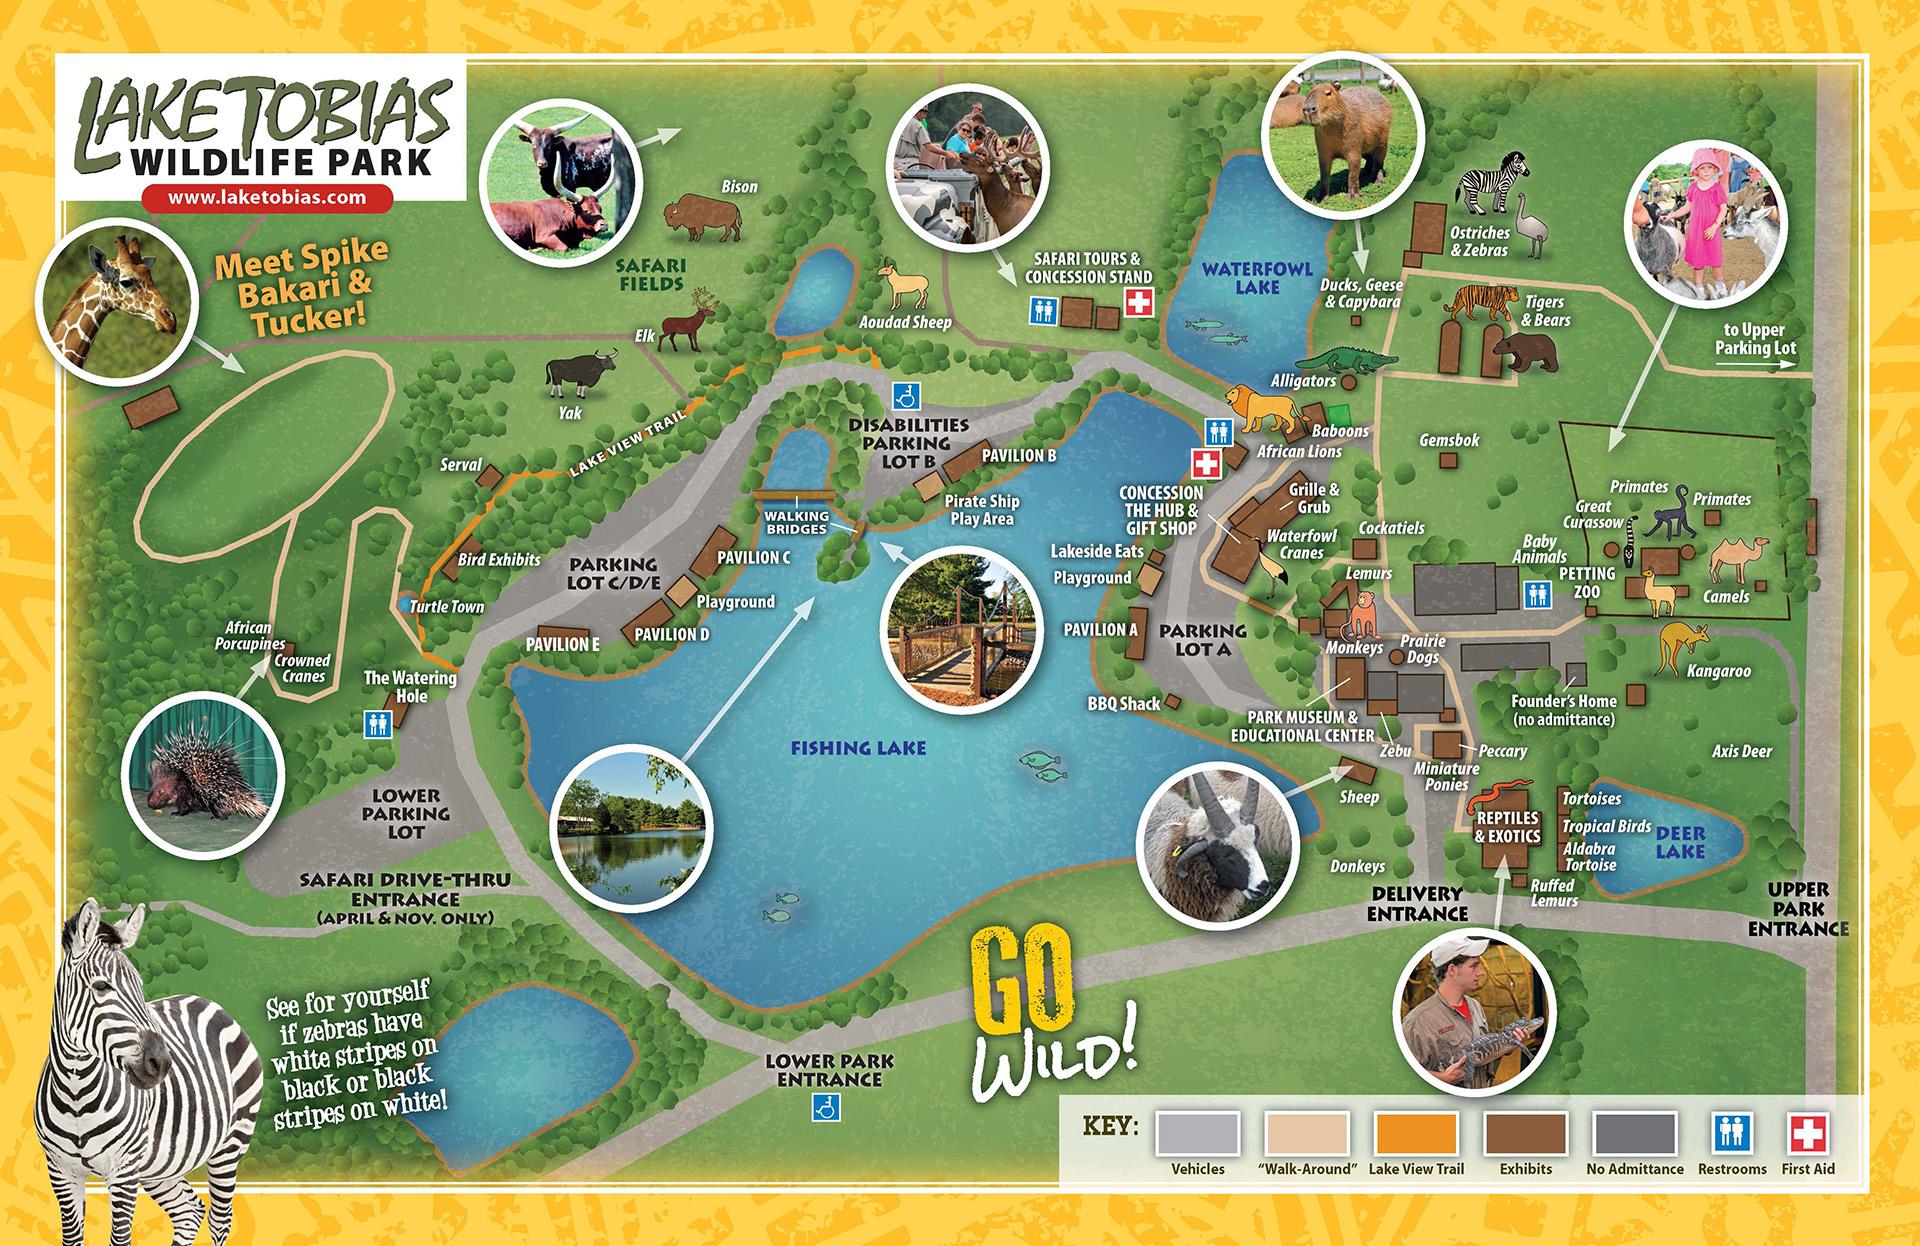 Lake Tobias Wildlife Park map